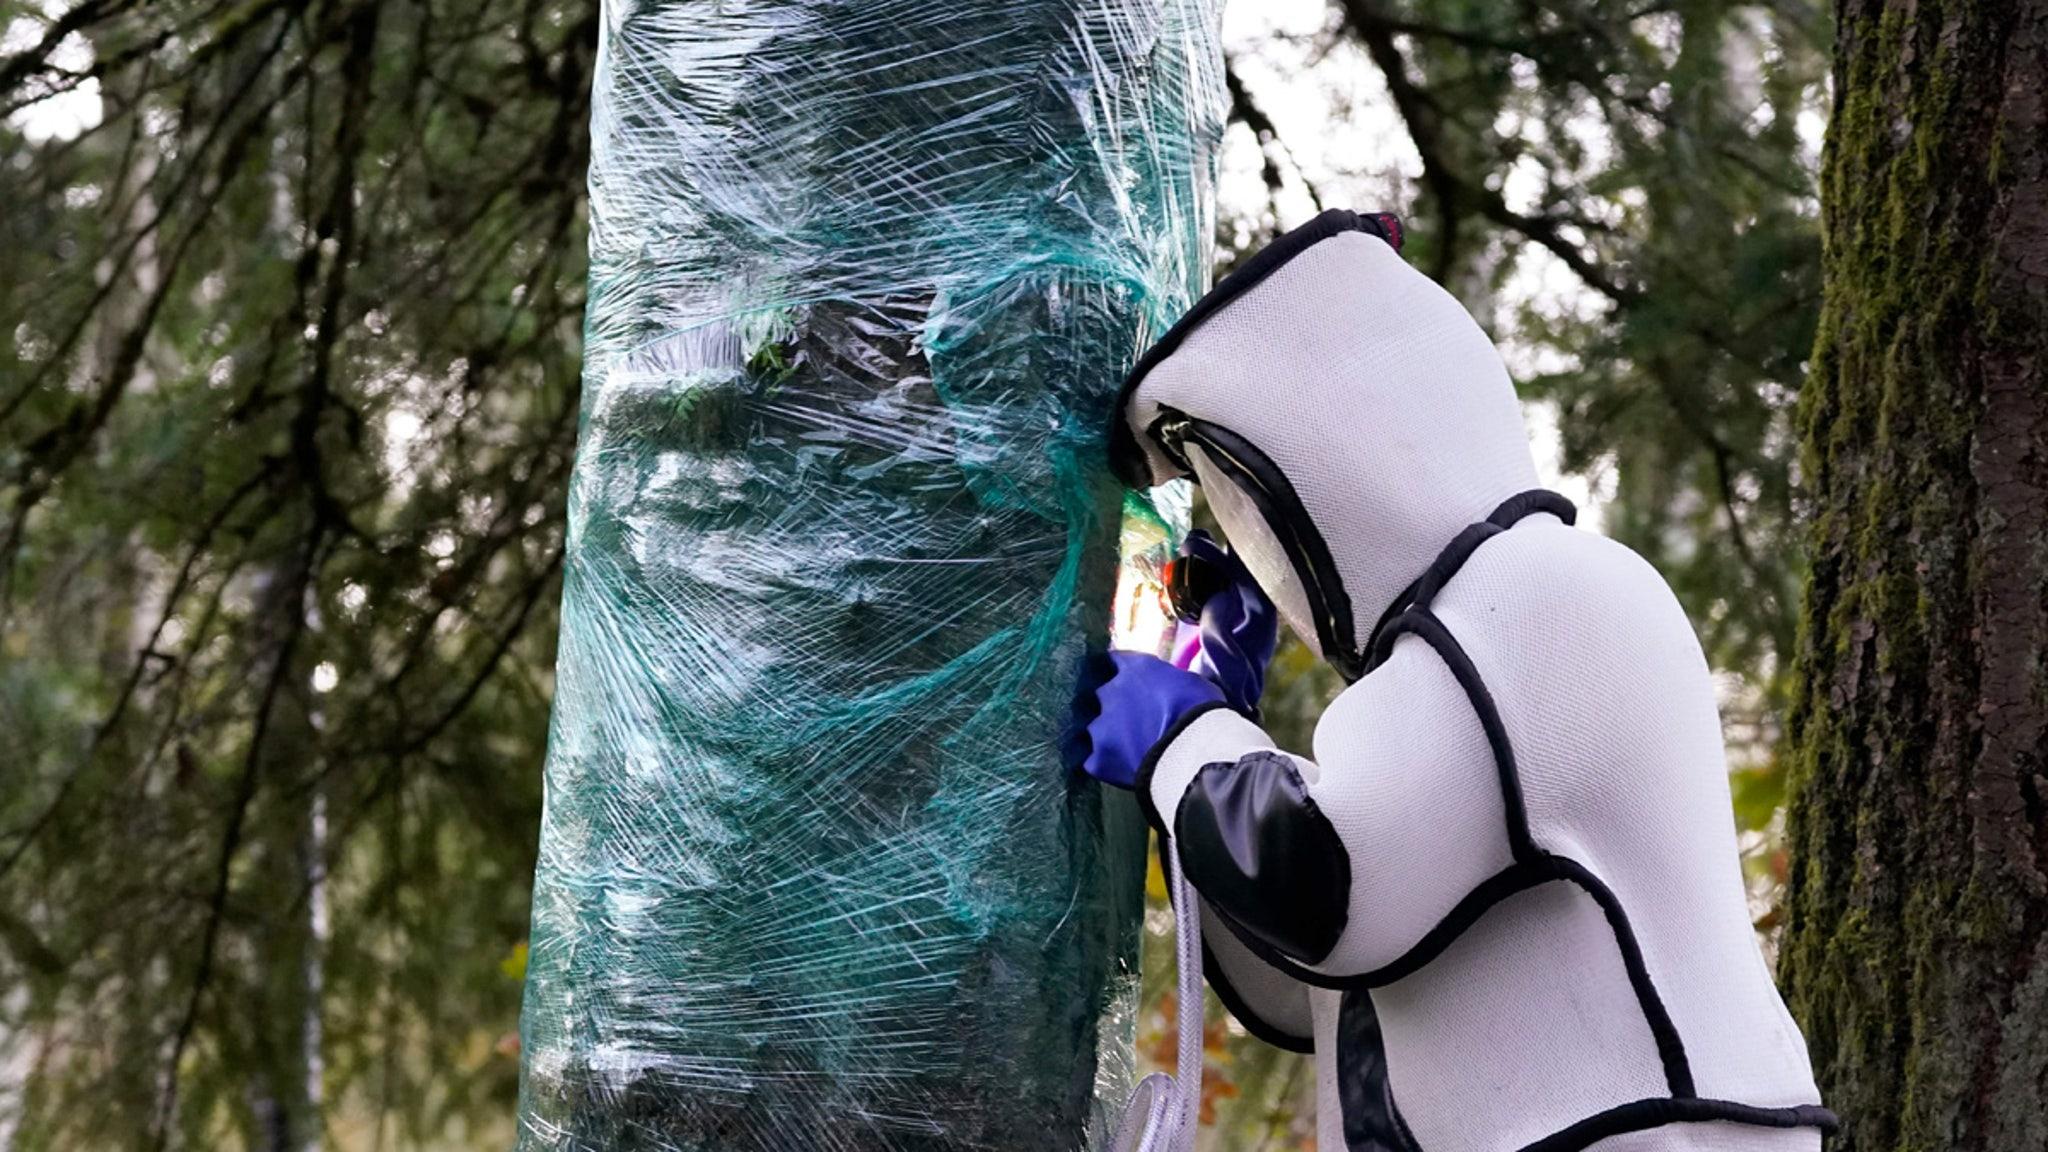 Murder Hornets' Queen She Lives!!! Still in Tree, Job Not Done